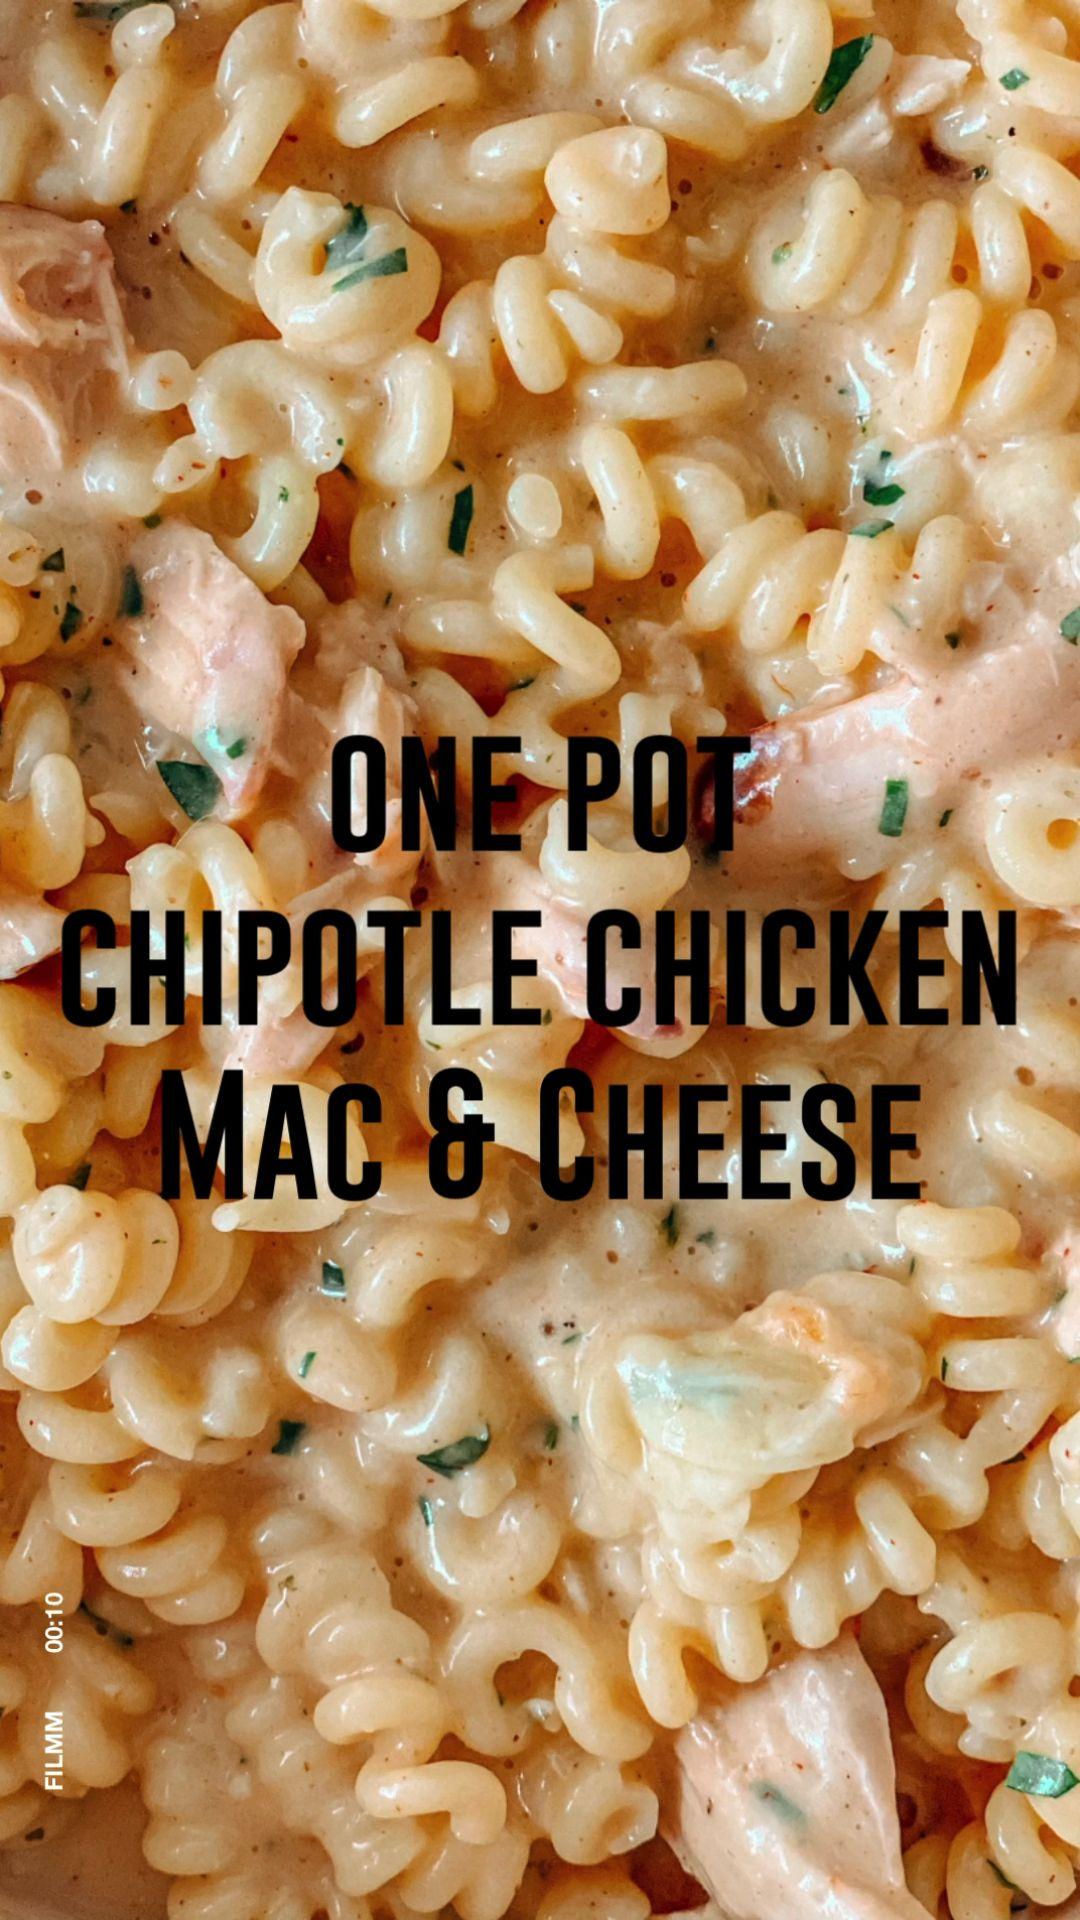 One Pot Chipotle Chicken Macaroni & Cheese